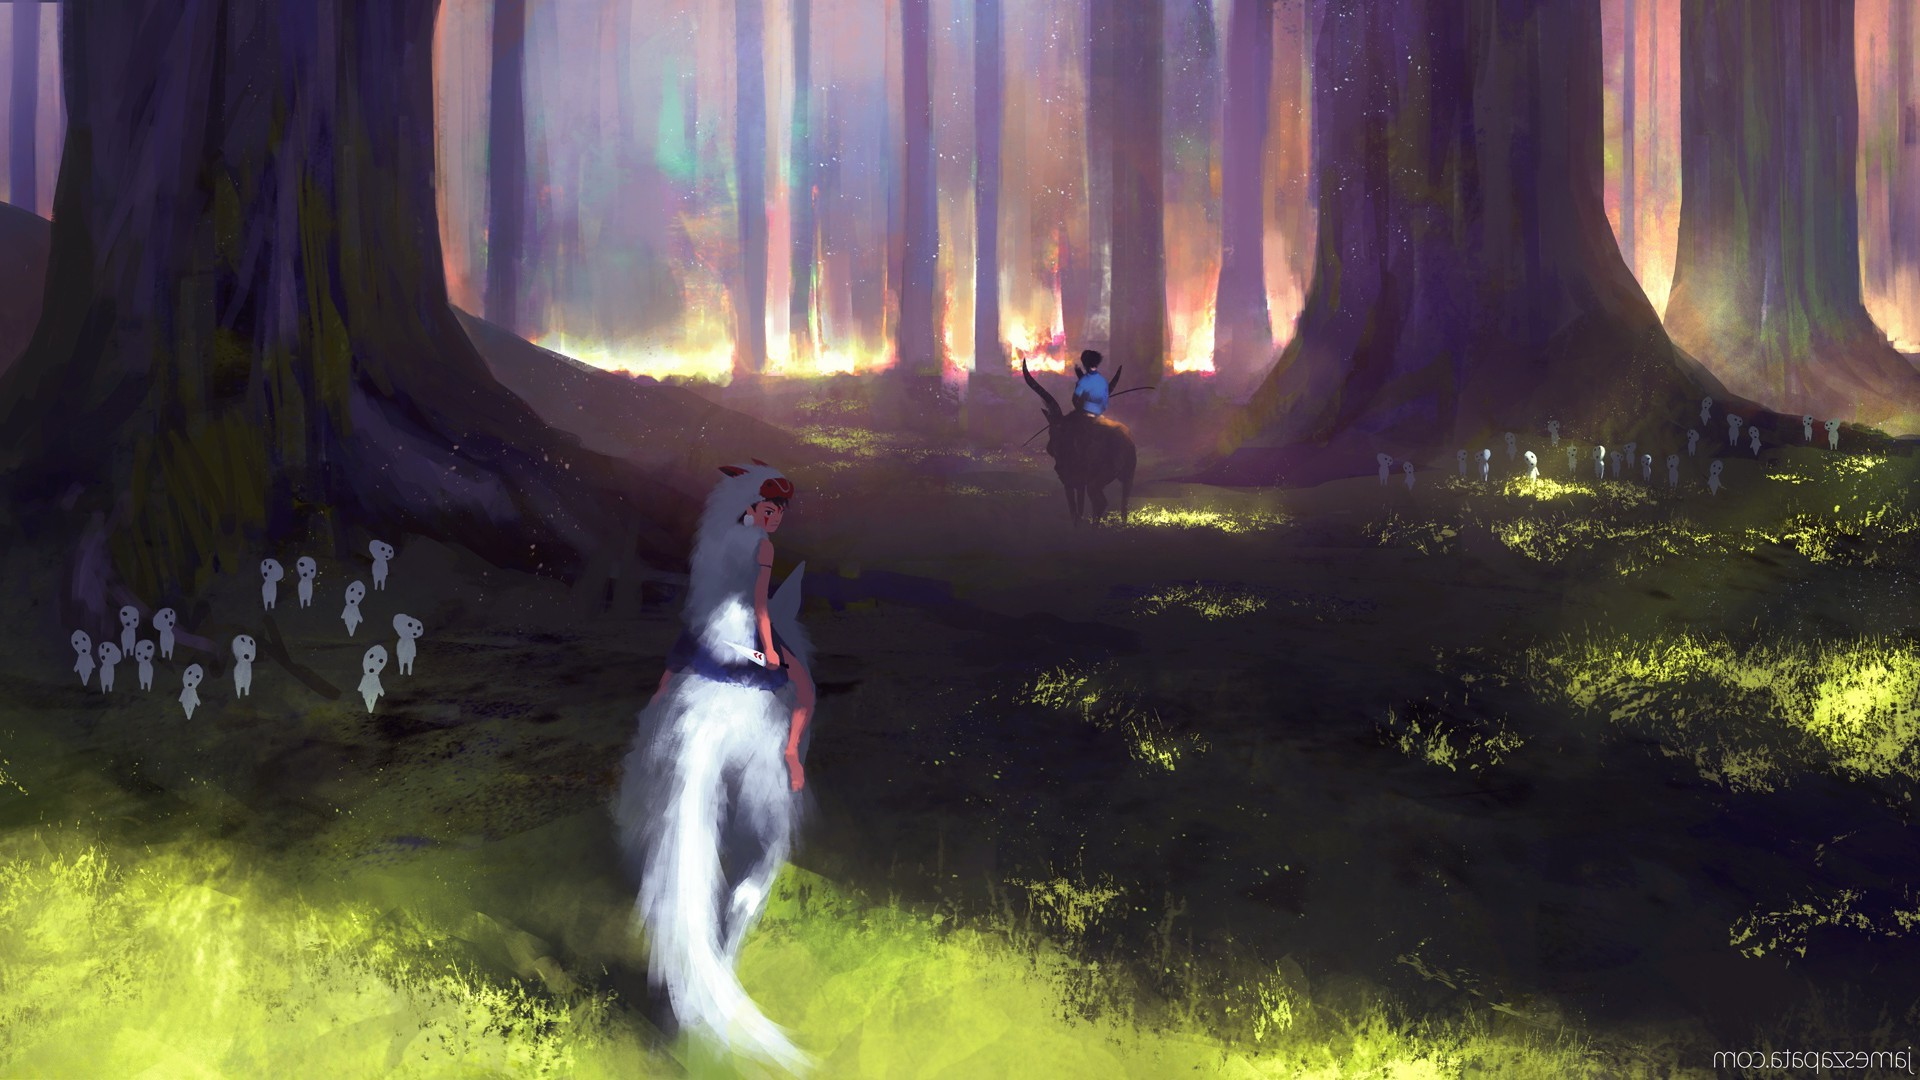 Studio Ghibli Wallpapers (71+ Images